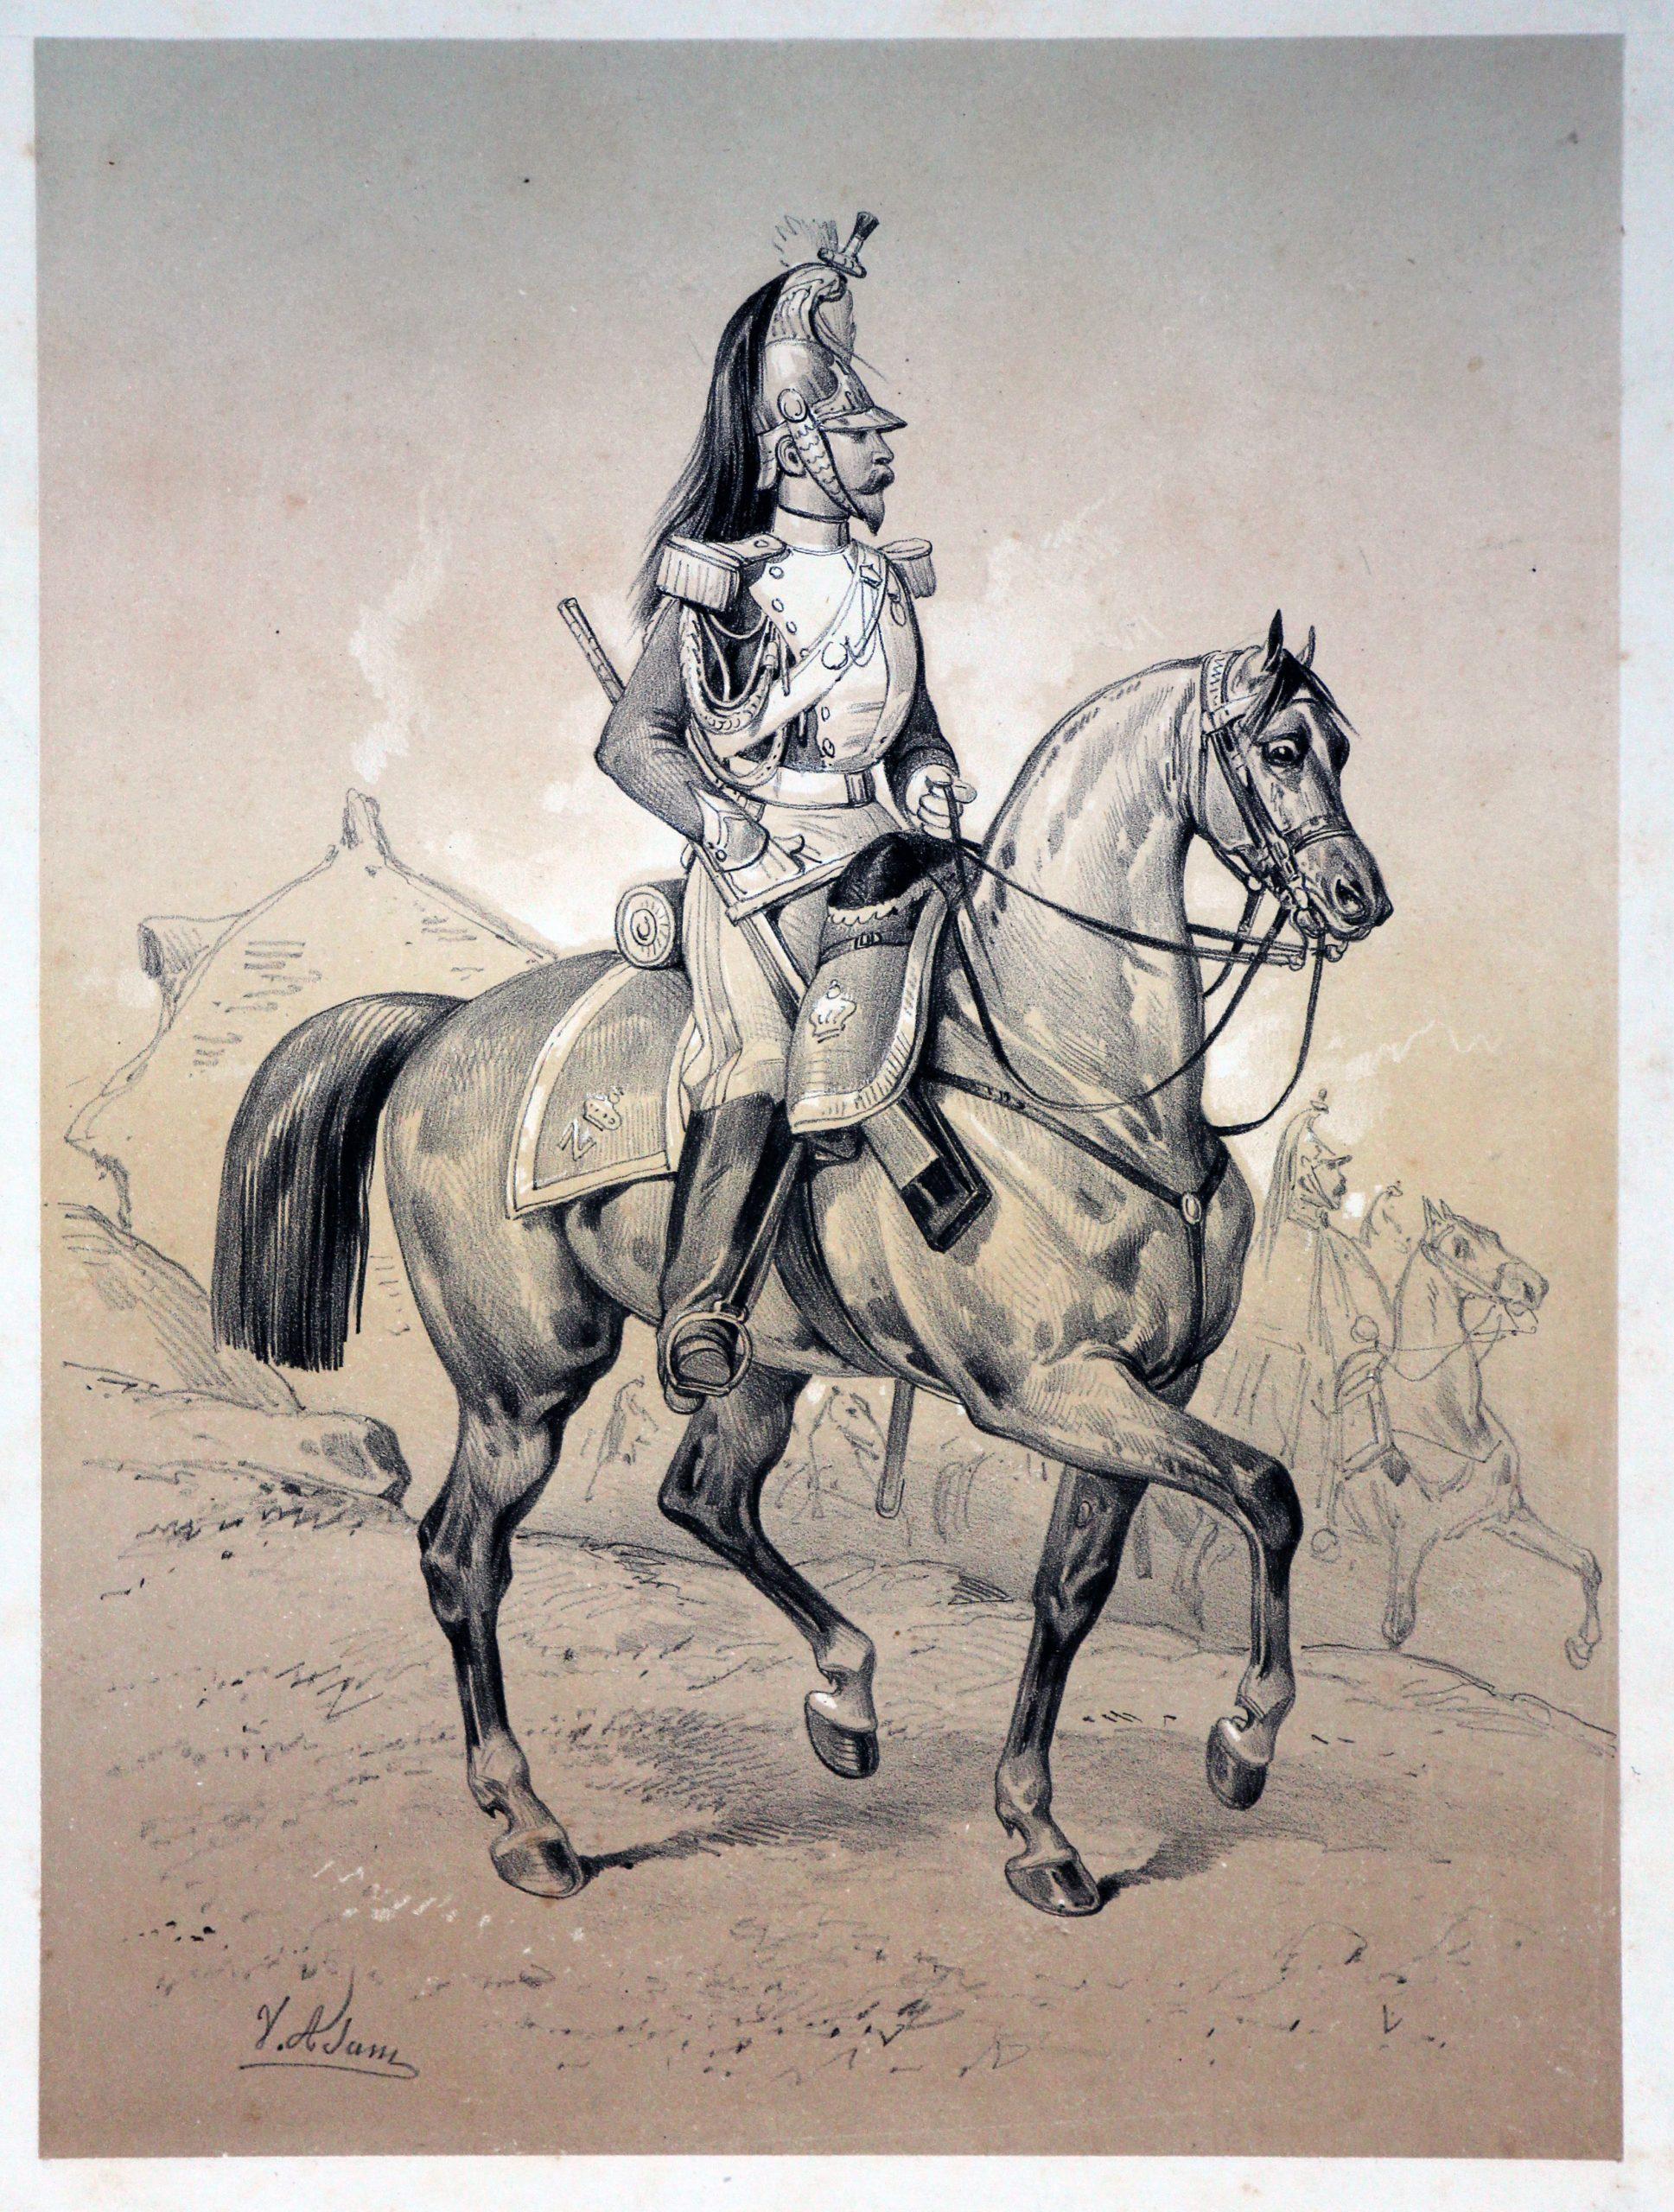 Gravures XIX - Victor Adam - Second Empire - Uniforme - Dragons de la Garde Impériale - Napoléon III - Cavalerie